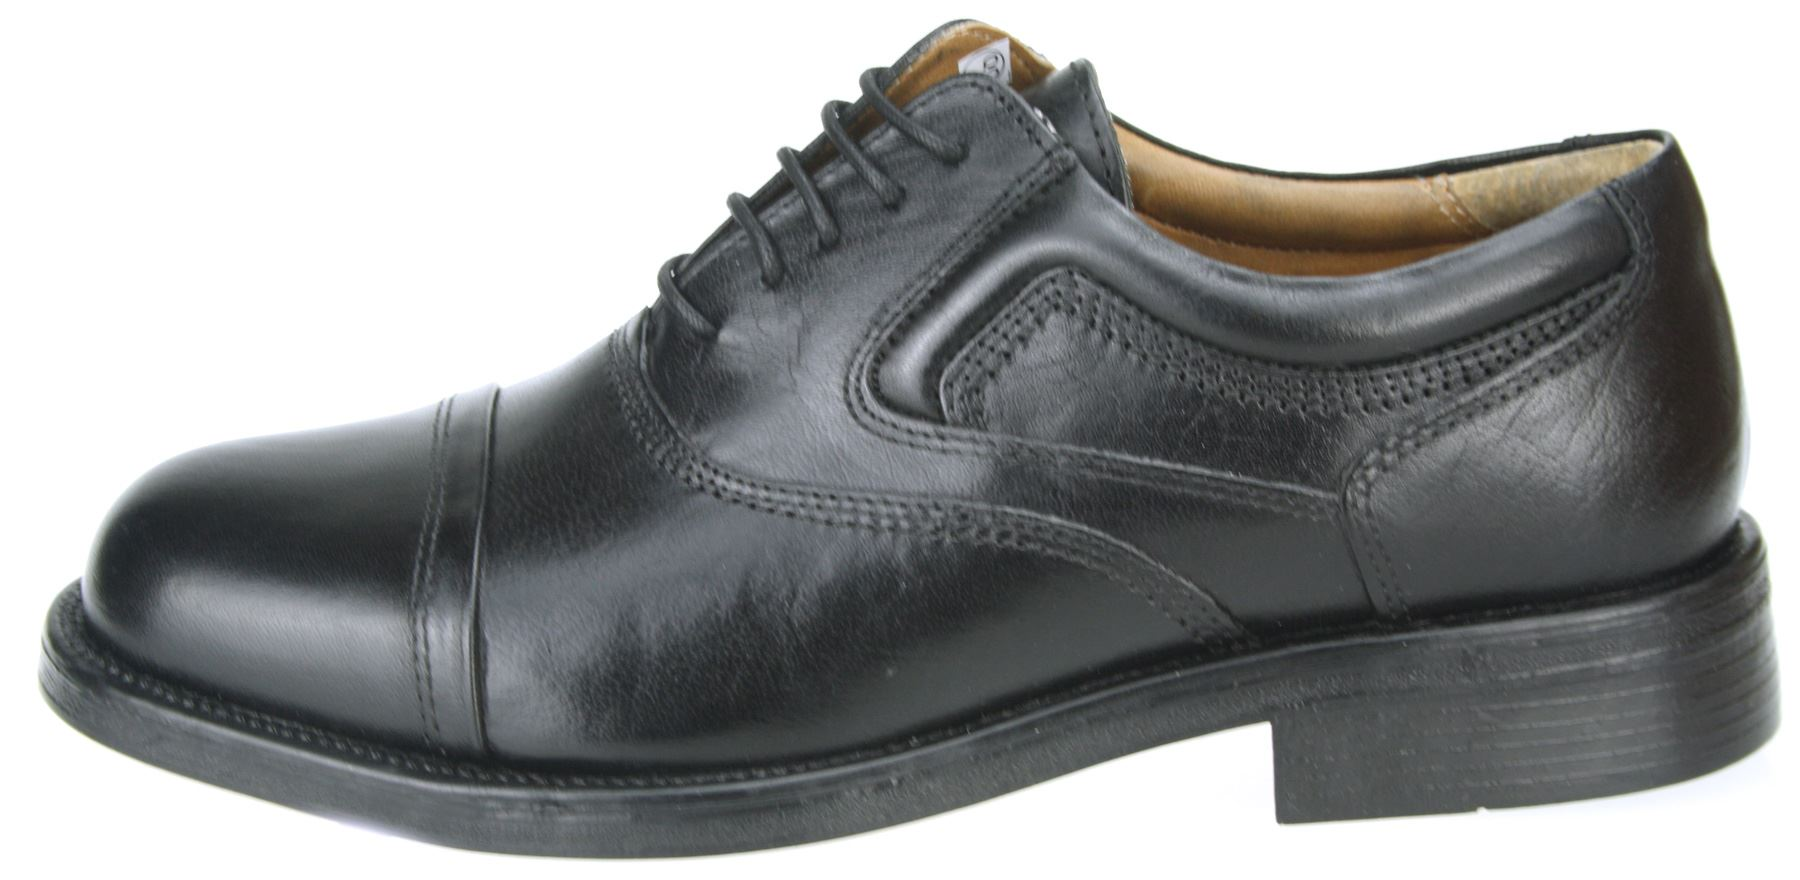 oaktrak stonebridge oxford cap black leather toe